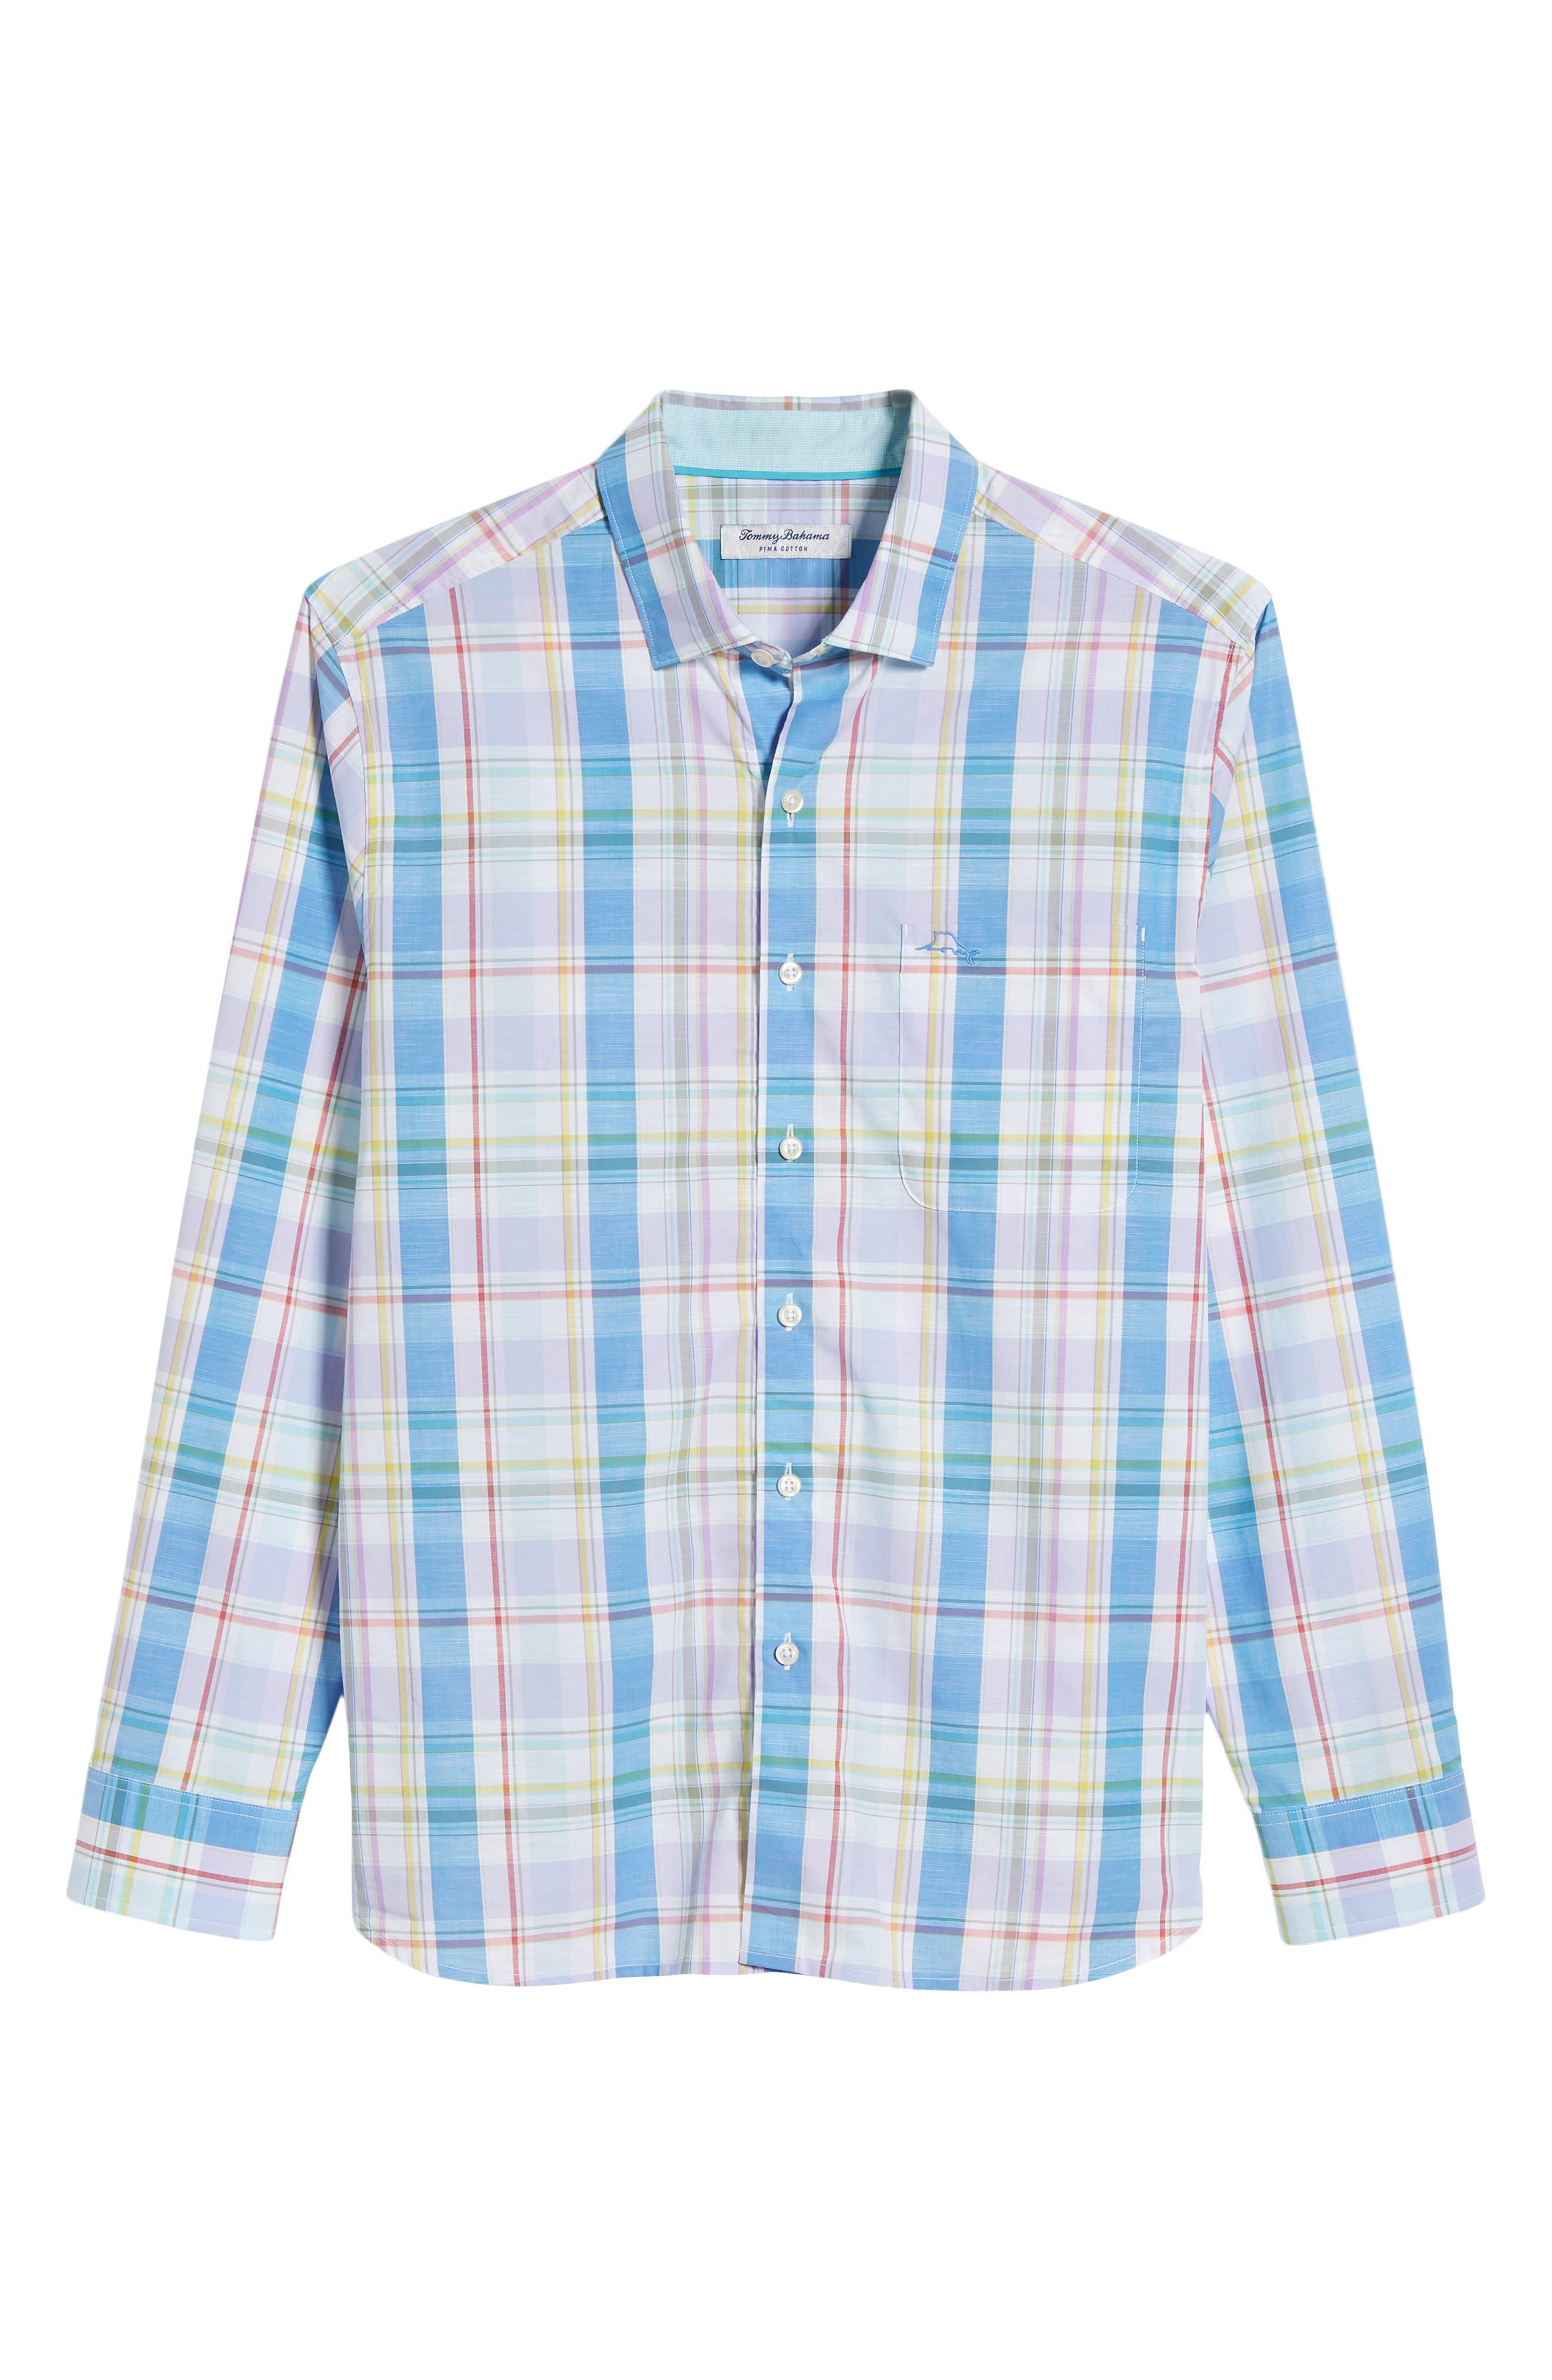 Privada Plaid Sport Shirt,                             Alternate thumbnail 6, color,                             400